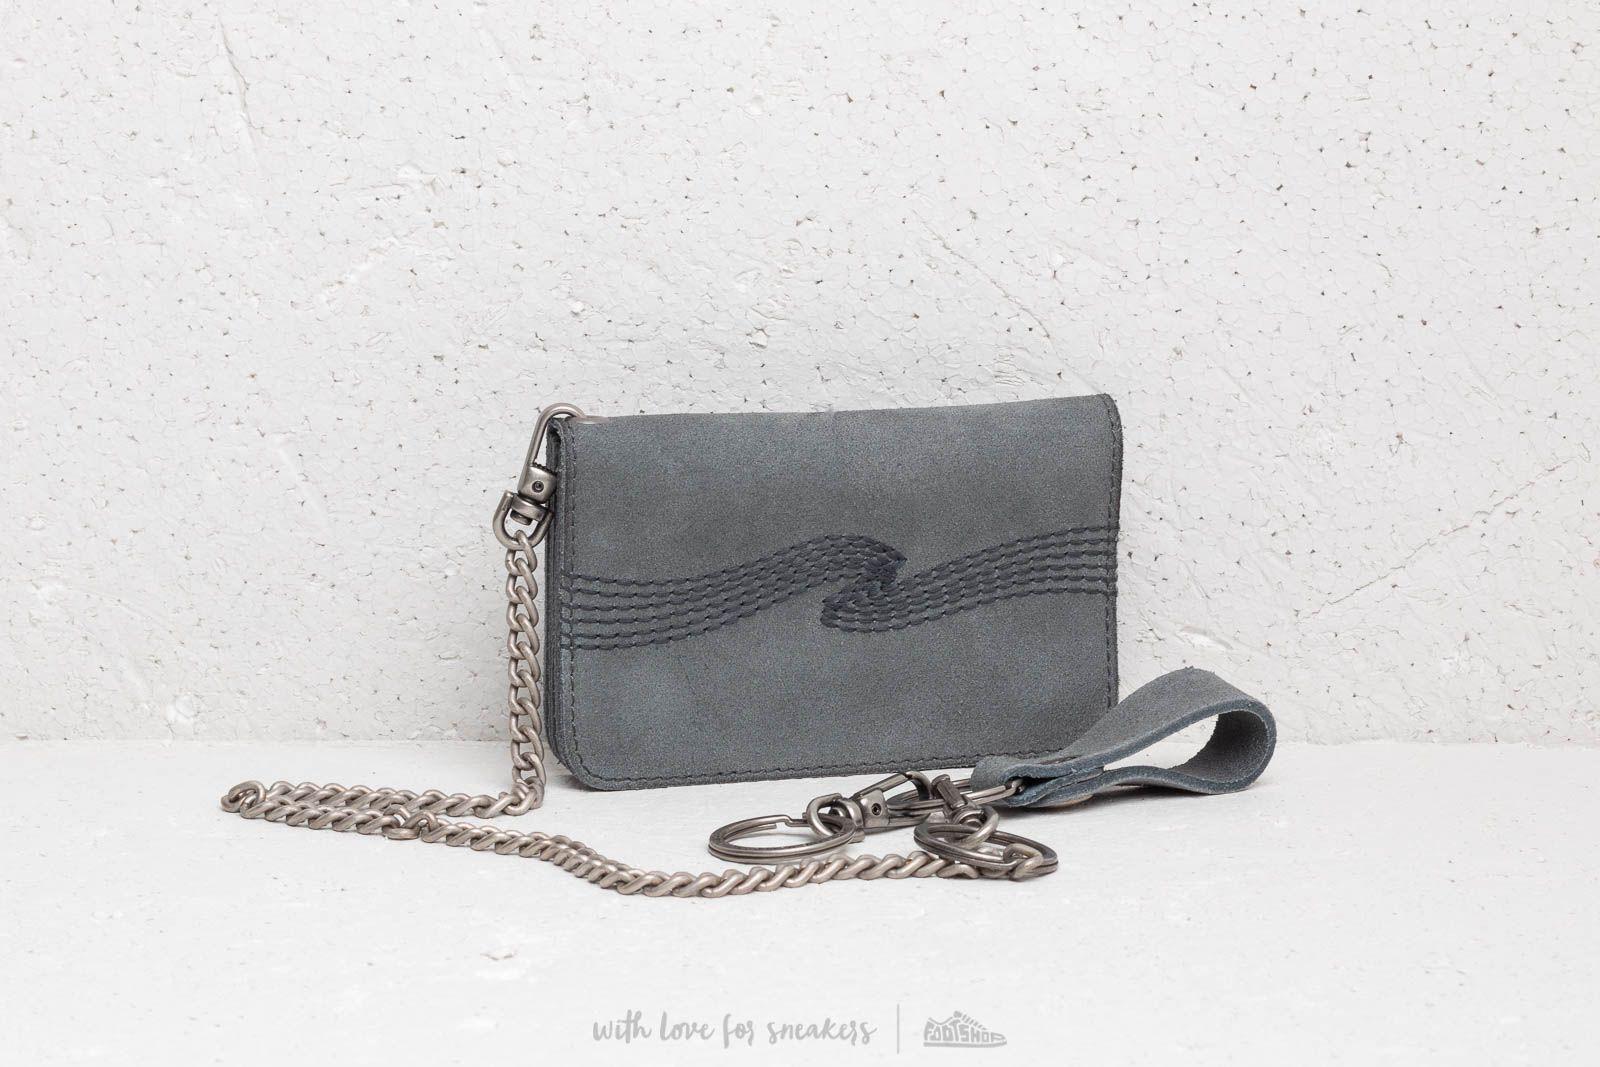 Nudie Jeans Alfredsson Suede Wallet Grey za skvelú cenu 143 € kúpite na Footshop.sk